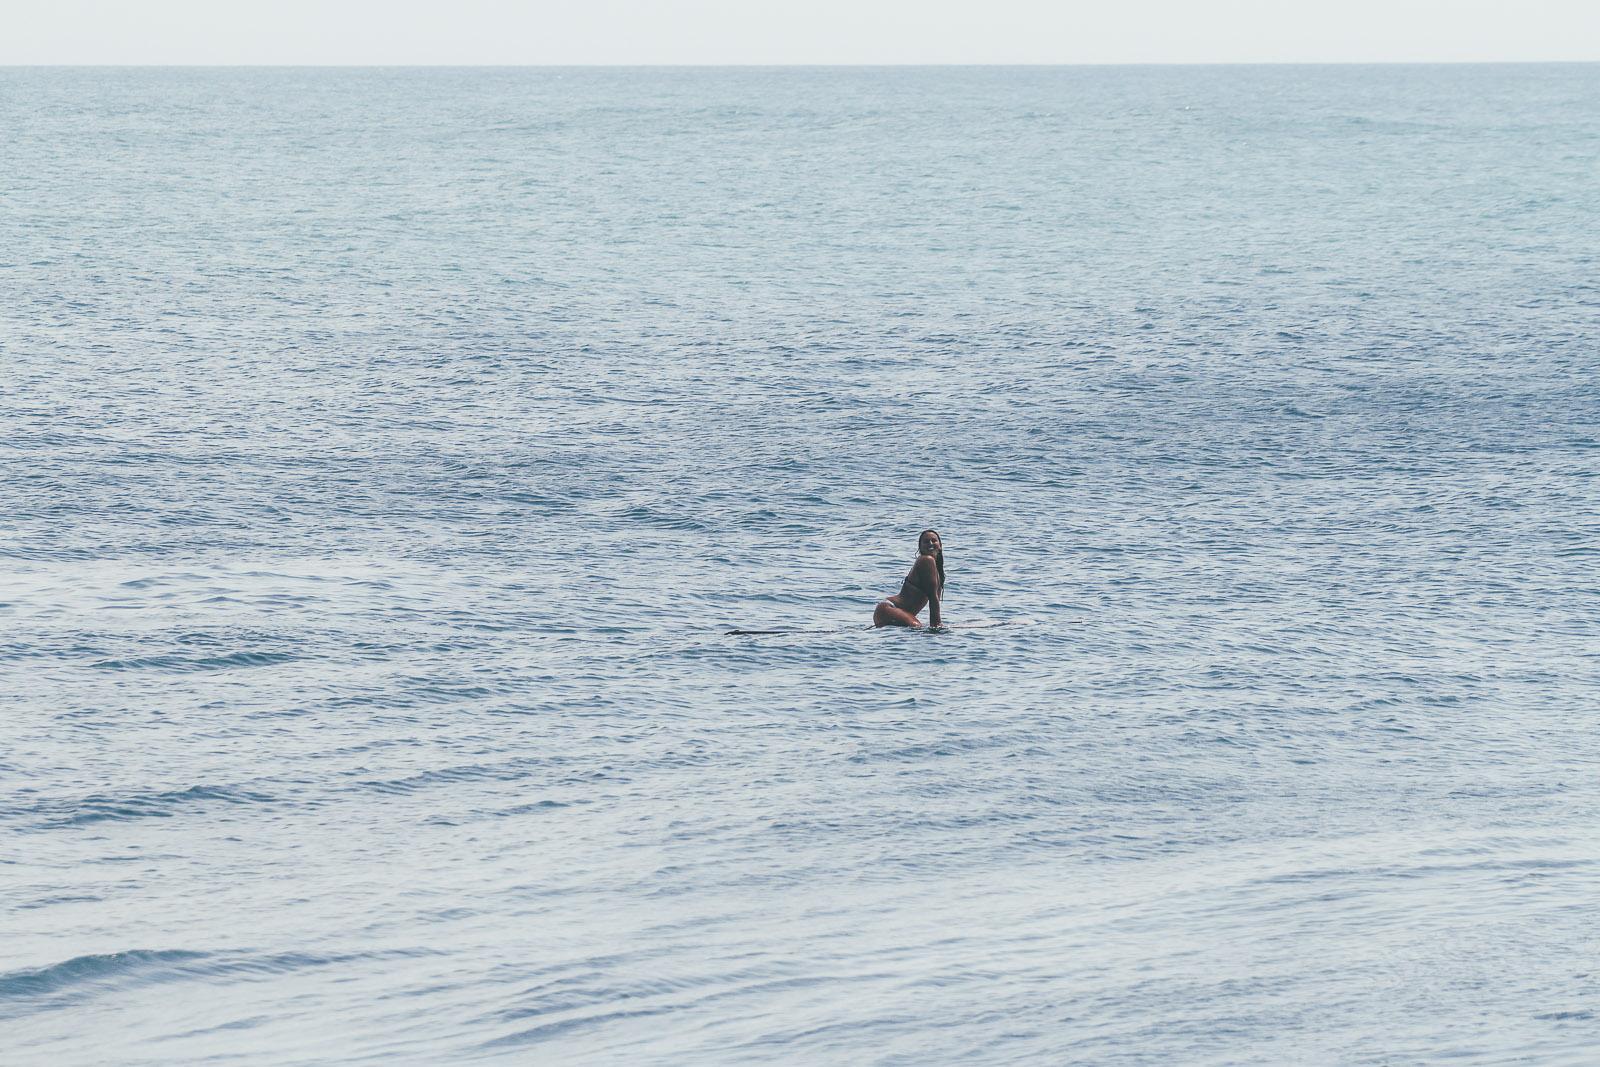 Sunshinestories-surf-travel-blog-IMG_8197